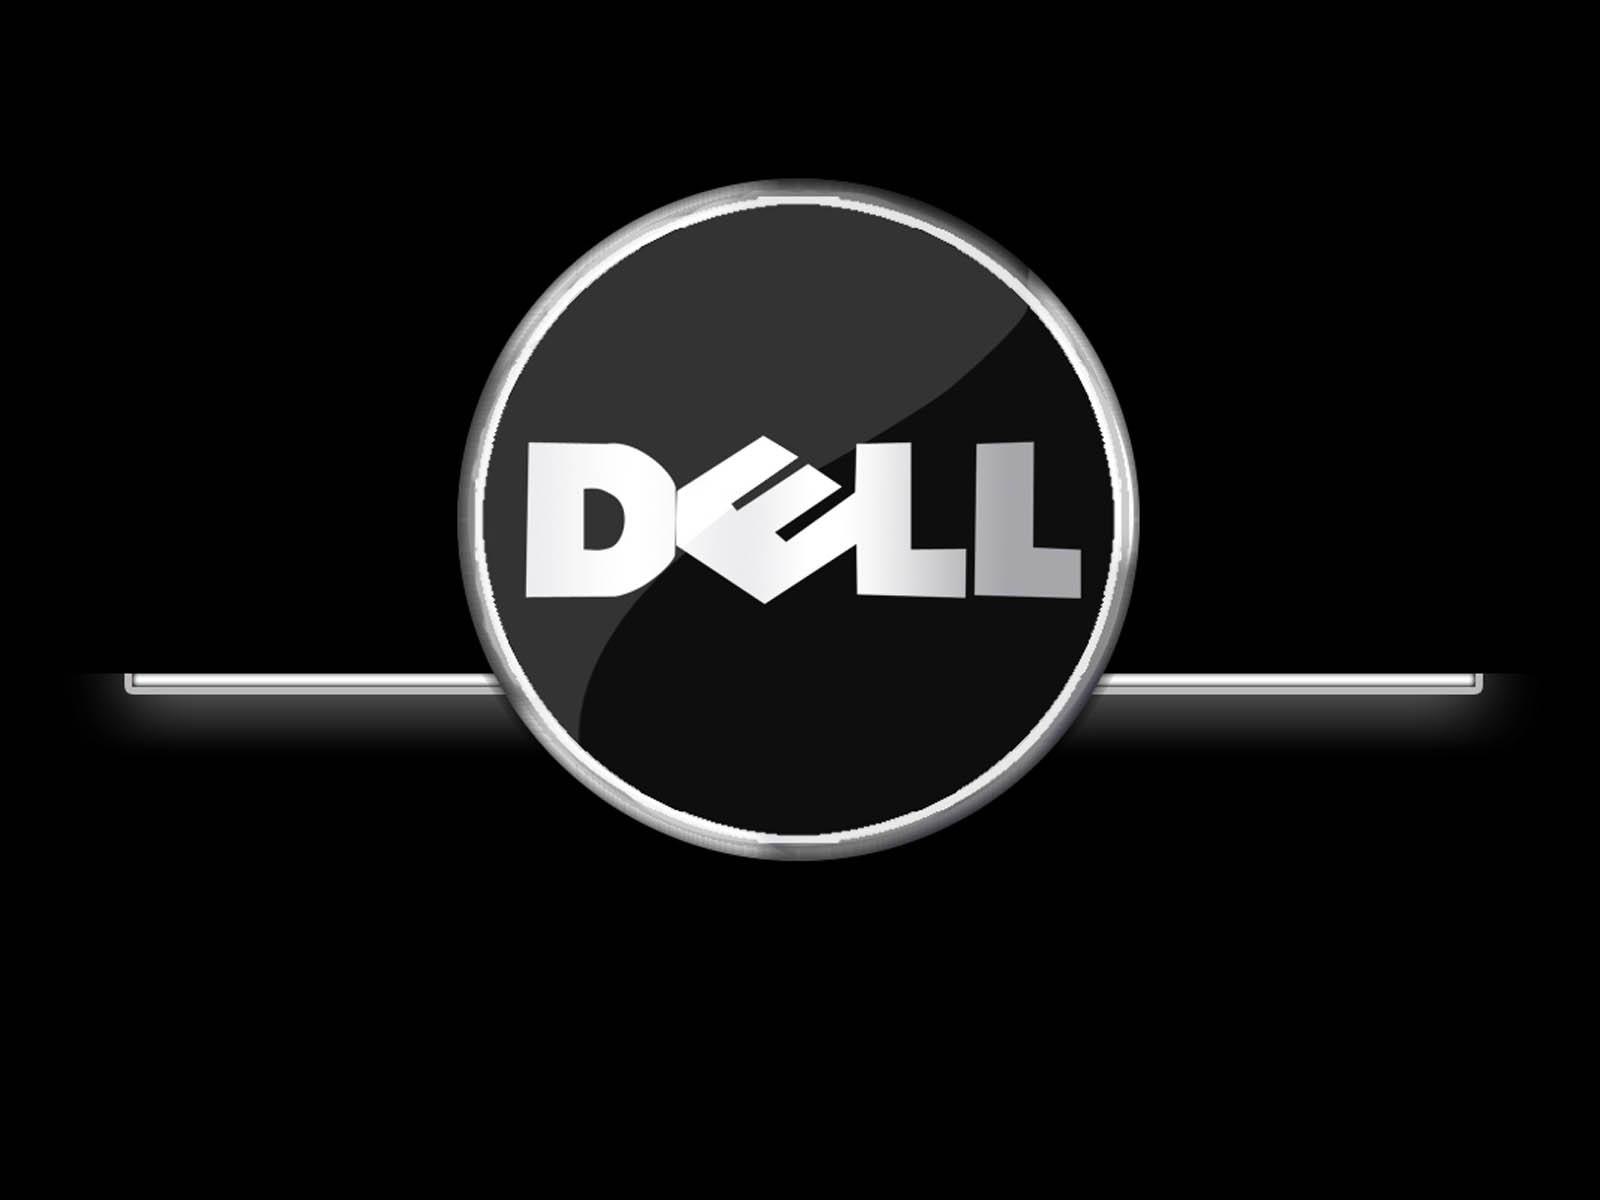 Dell Desktop Wallpapers   rebsays 1600x1200